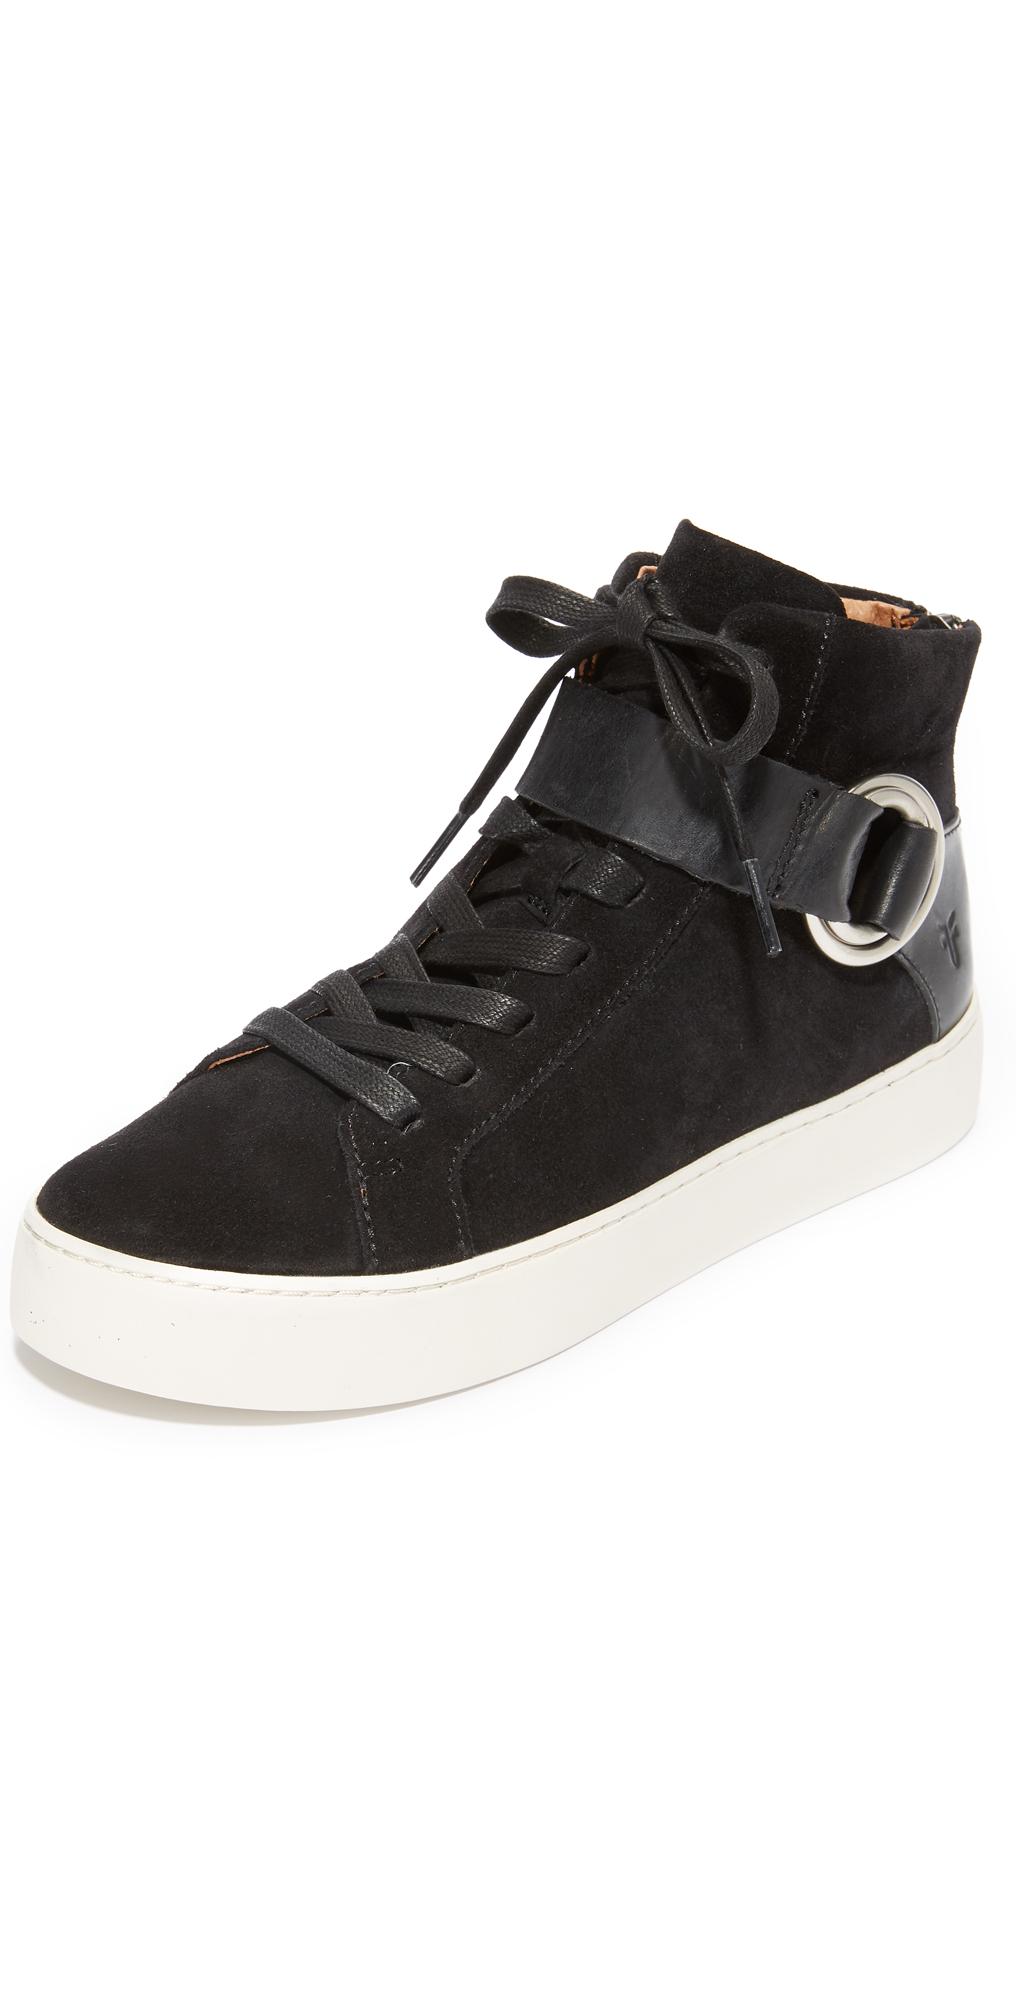 Lena Harness High Top Sneakers Frye